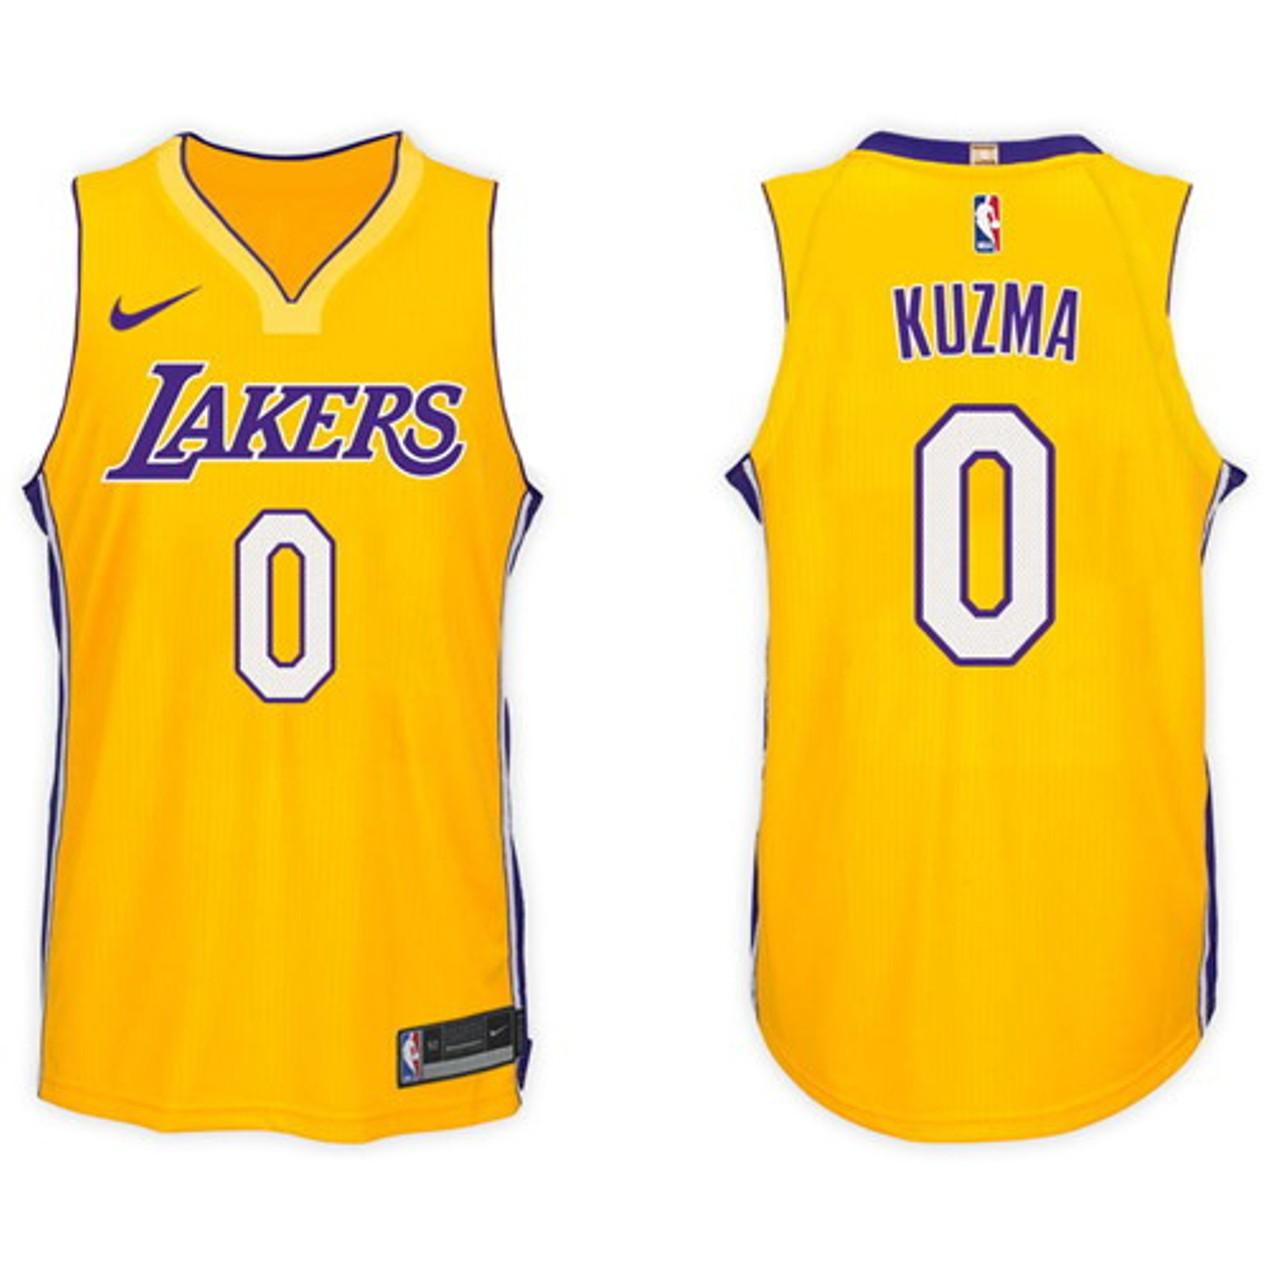 more photos 4dd29 e7b04 2017-18 wish Los Angeles Lakers #0 Kyle Kuzma Basketball ...